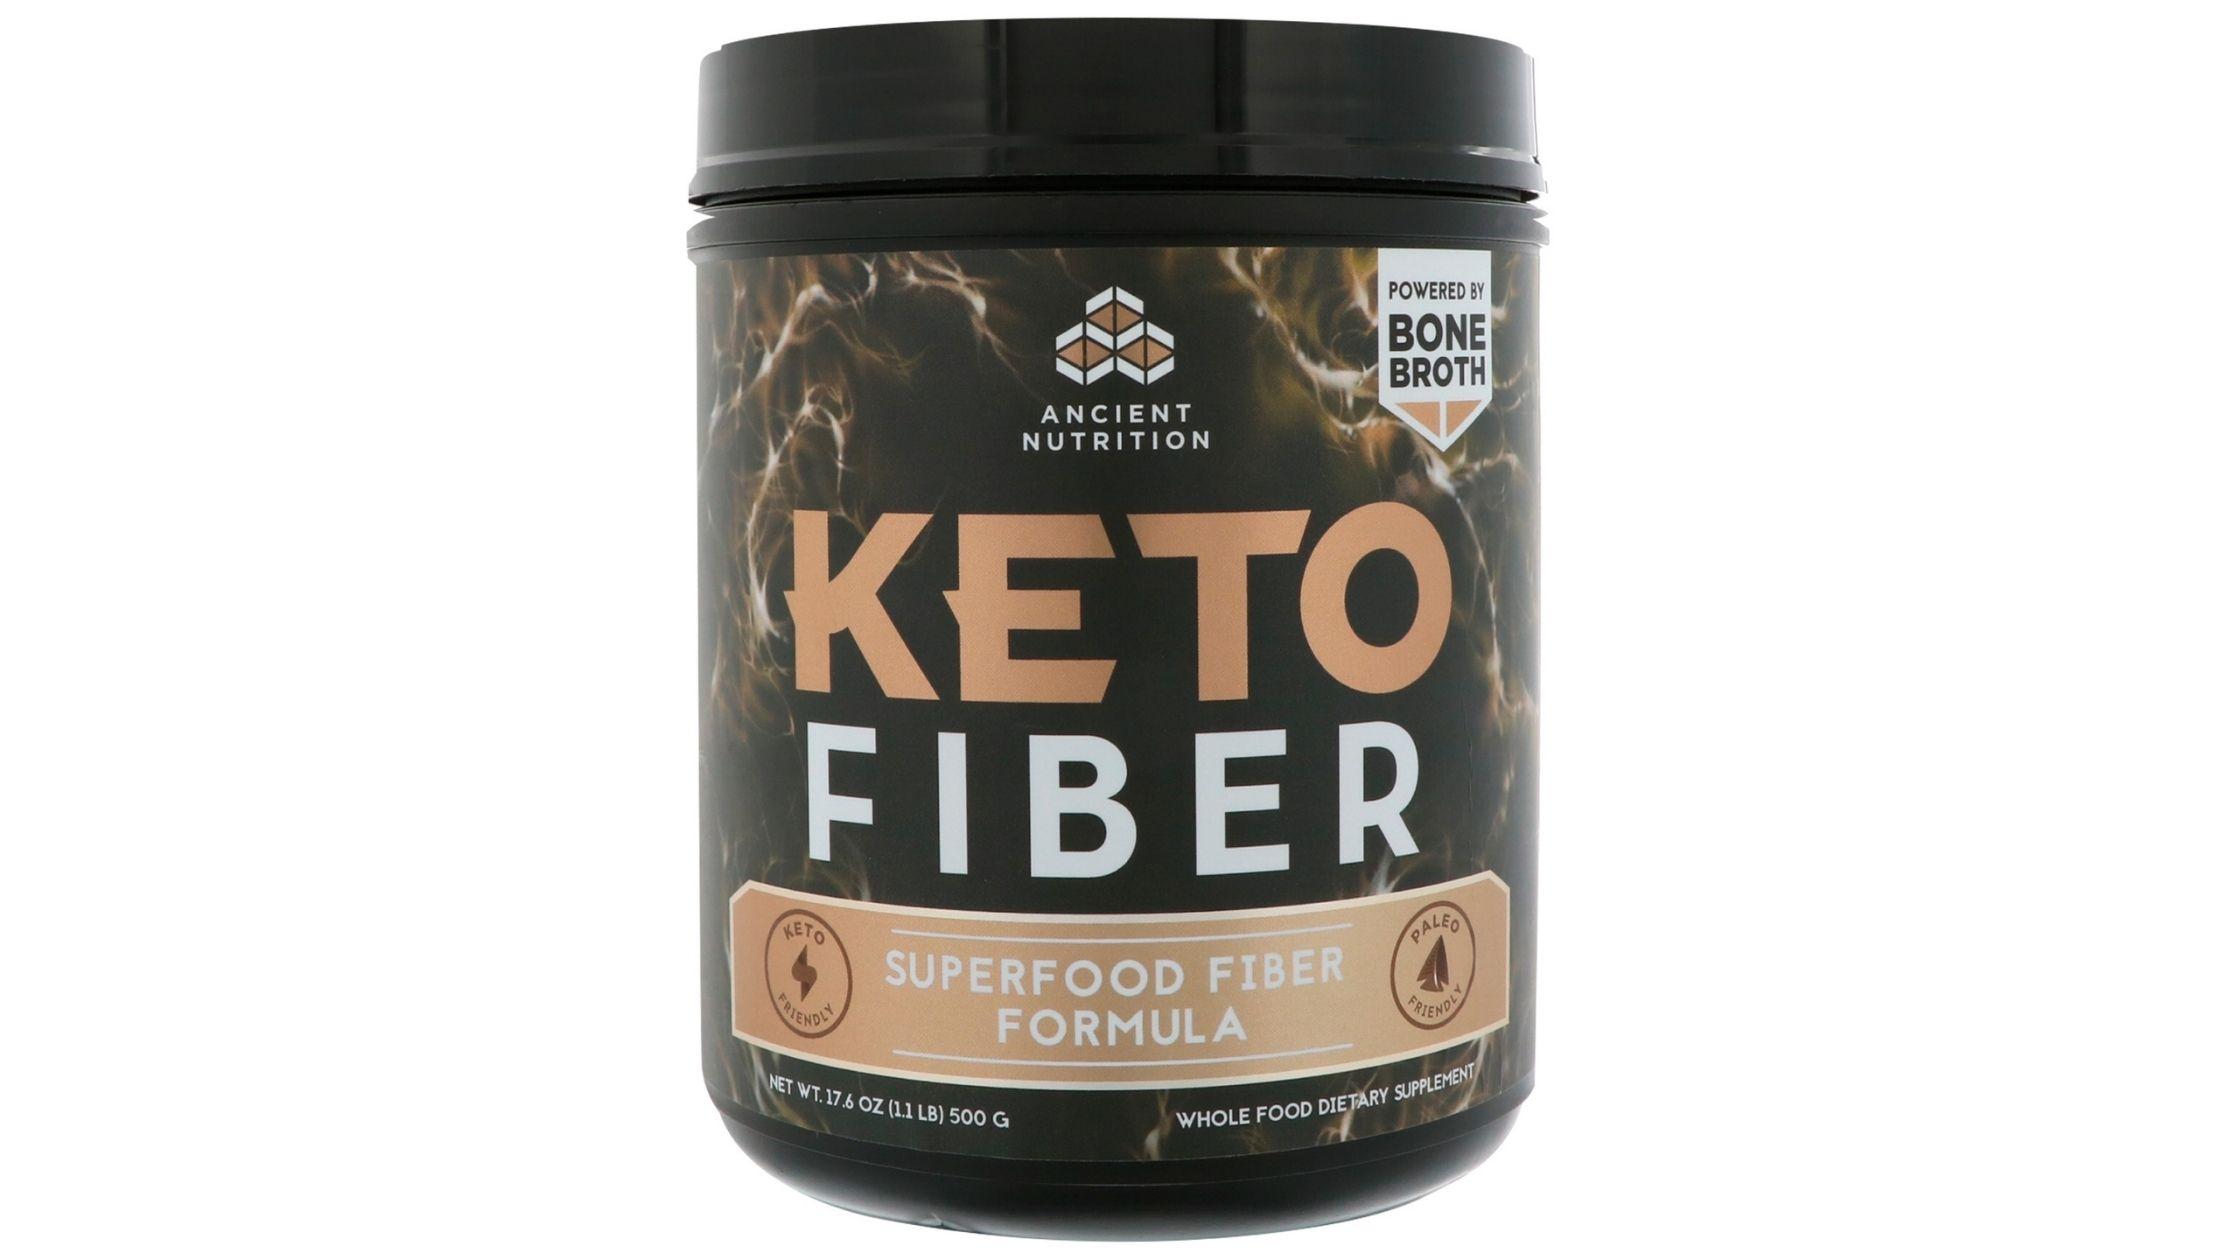 KetoFIBER powder by Ancient Nutrition